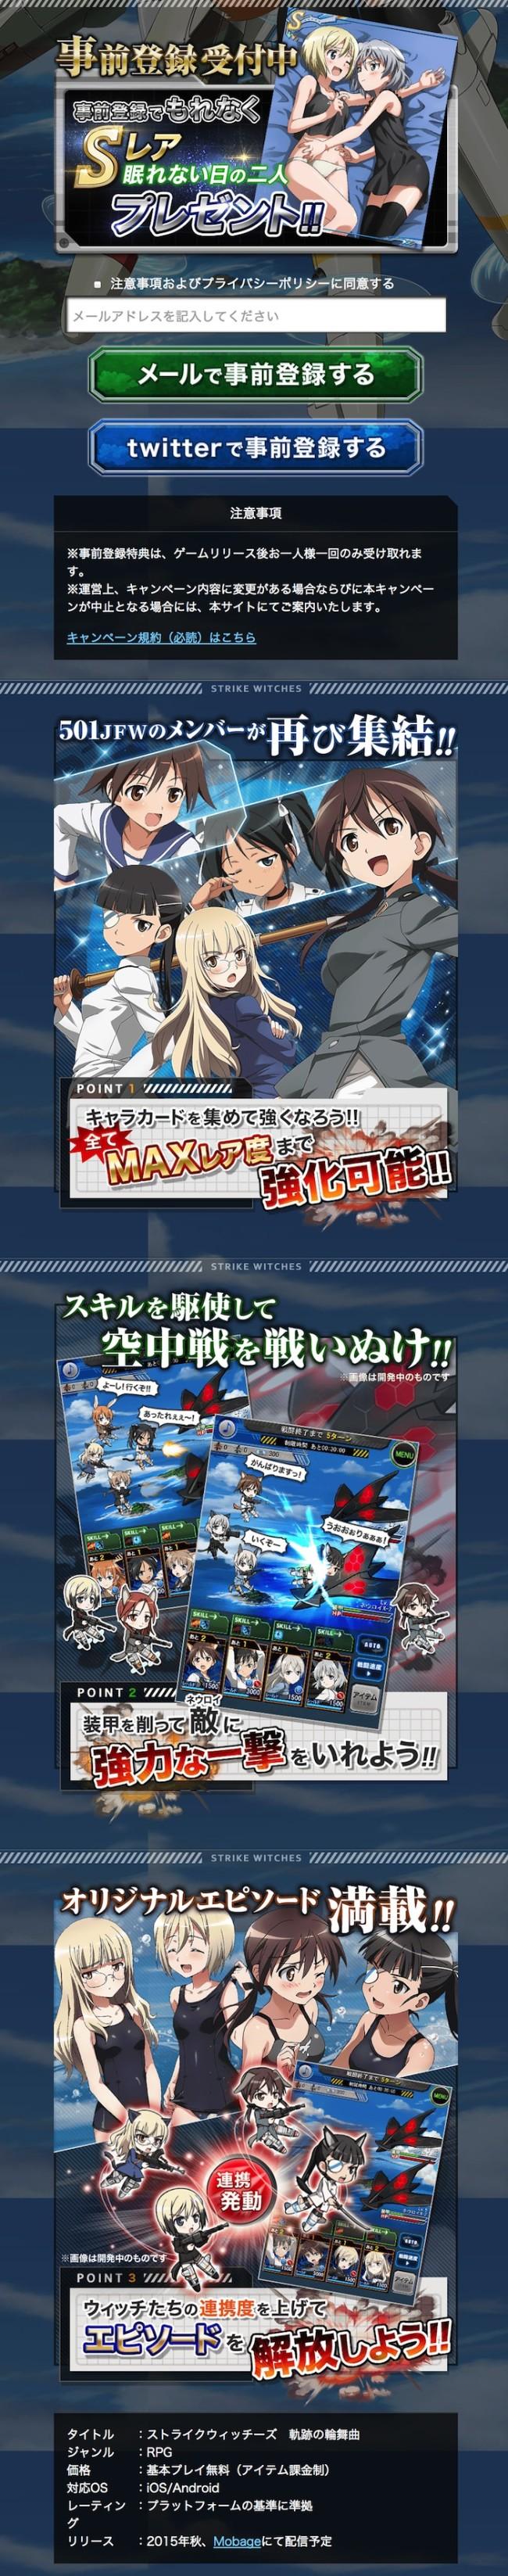 screencapture-s-witch-kiseki-jp-1437998307353 のコピー